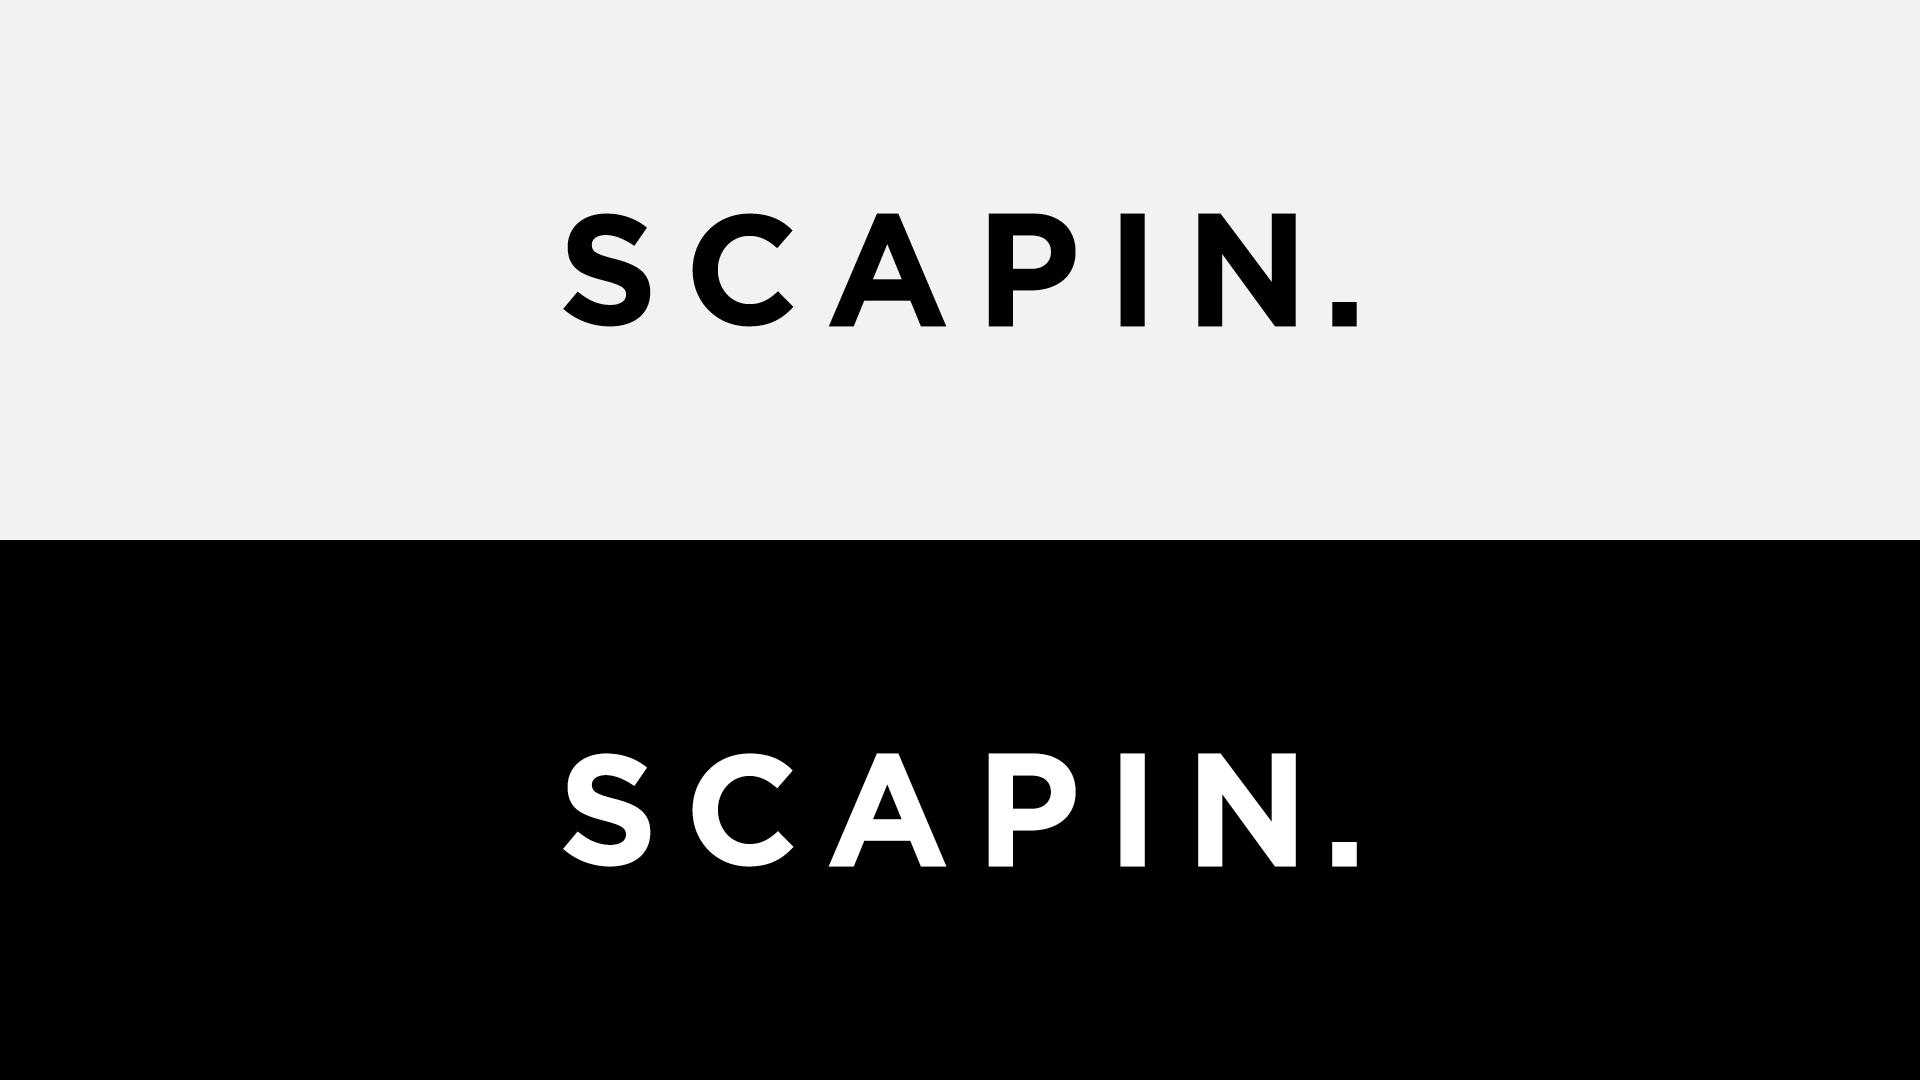 Scapin-logo2.jpg